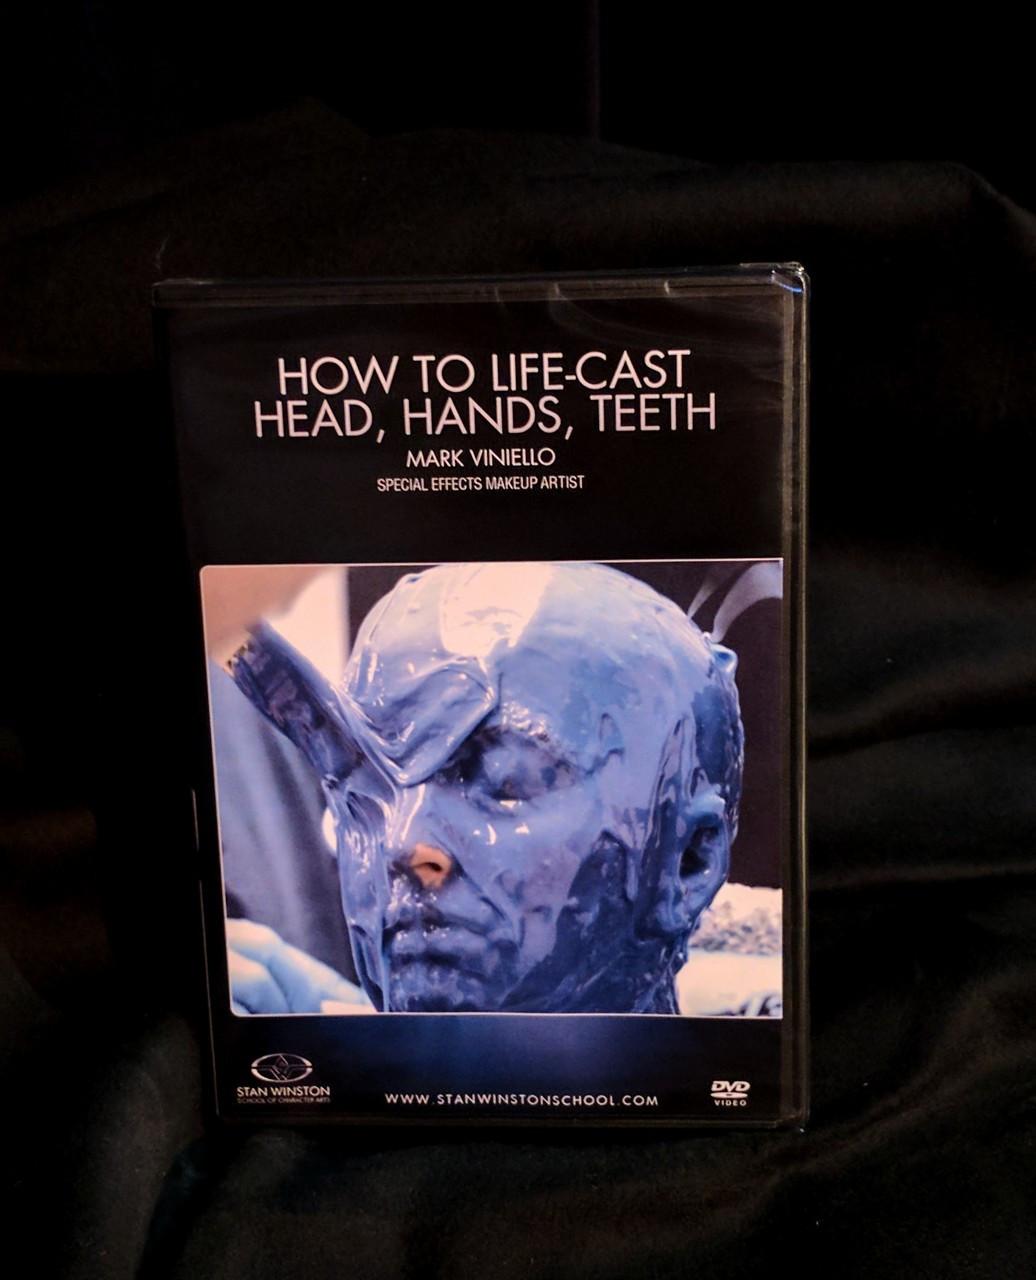 How To Life-Cast - Head, Hands & Teeth